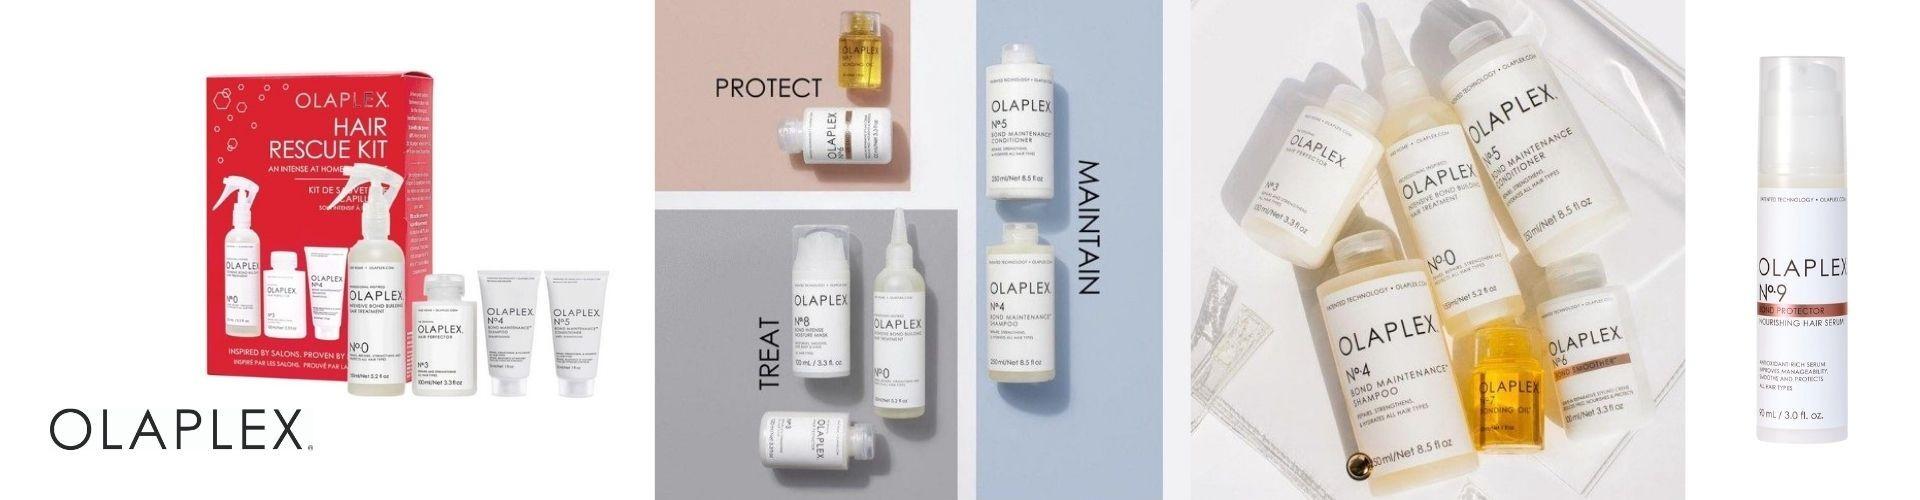 "Olaplex: -20% with the Promo code ""HAIRSHOP"""